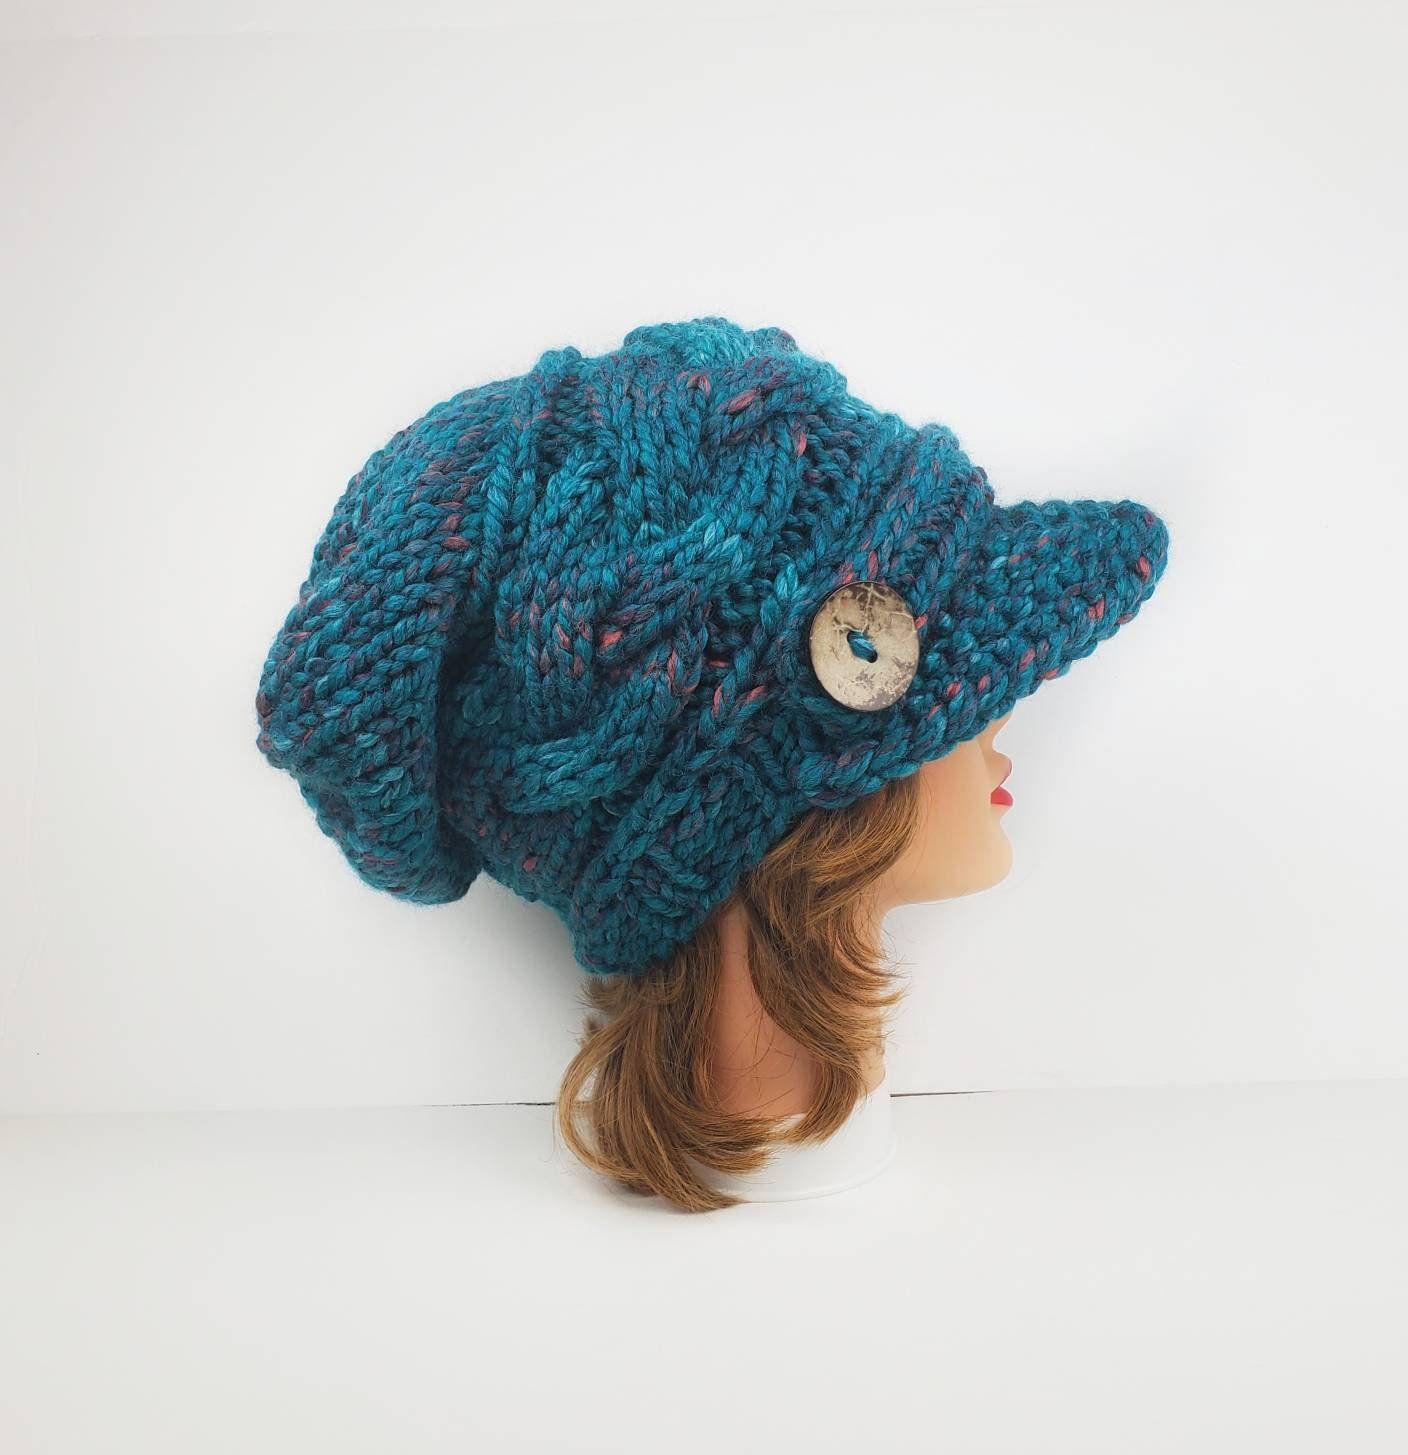 Newsboy Cap Visor Cap Hat Chunky Knit Hat Women Cable Knit Etsy Chunky Knit Hat Crochet Newsboy Hat Knitted Headband